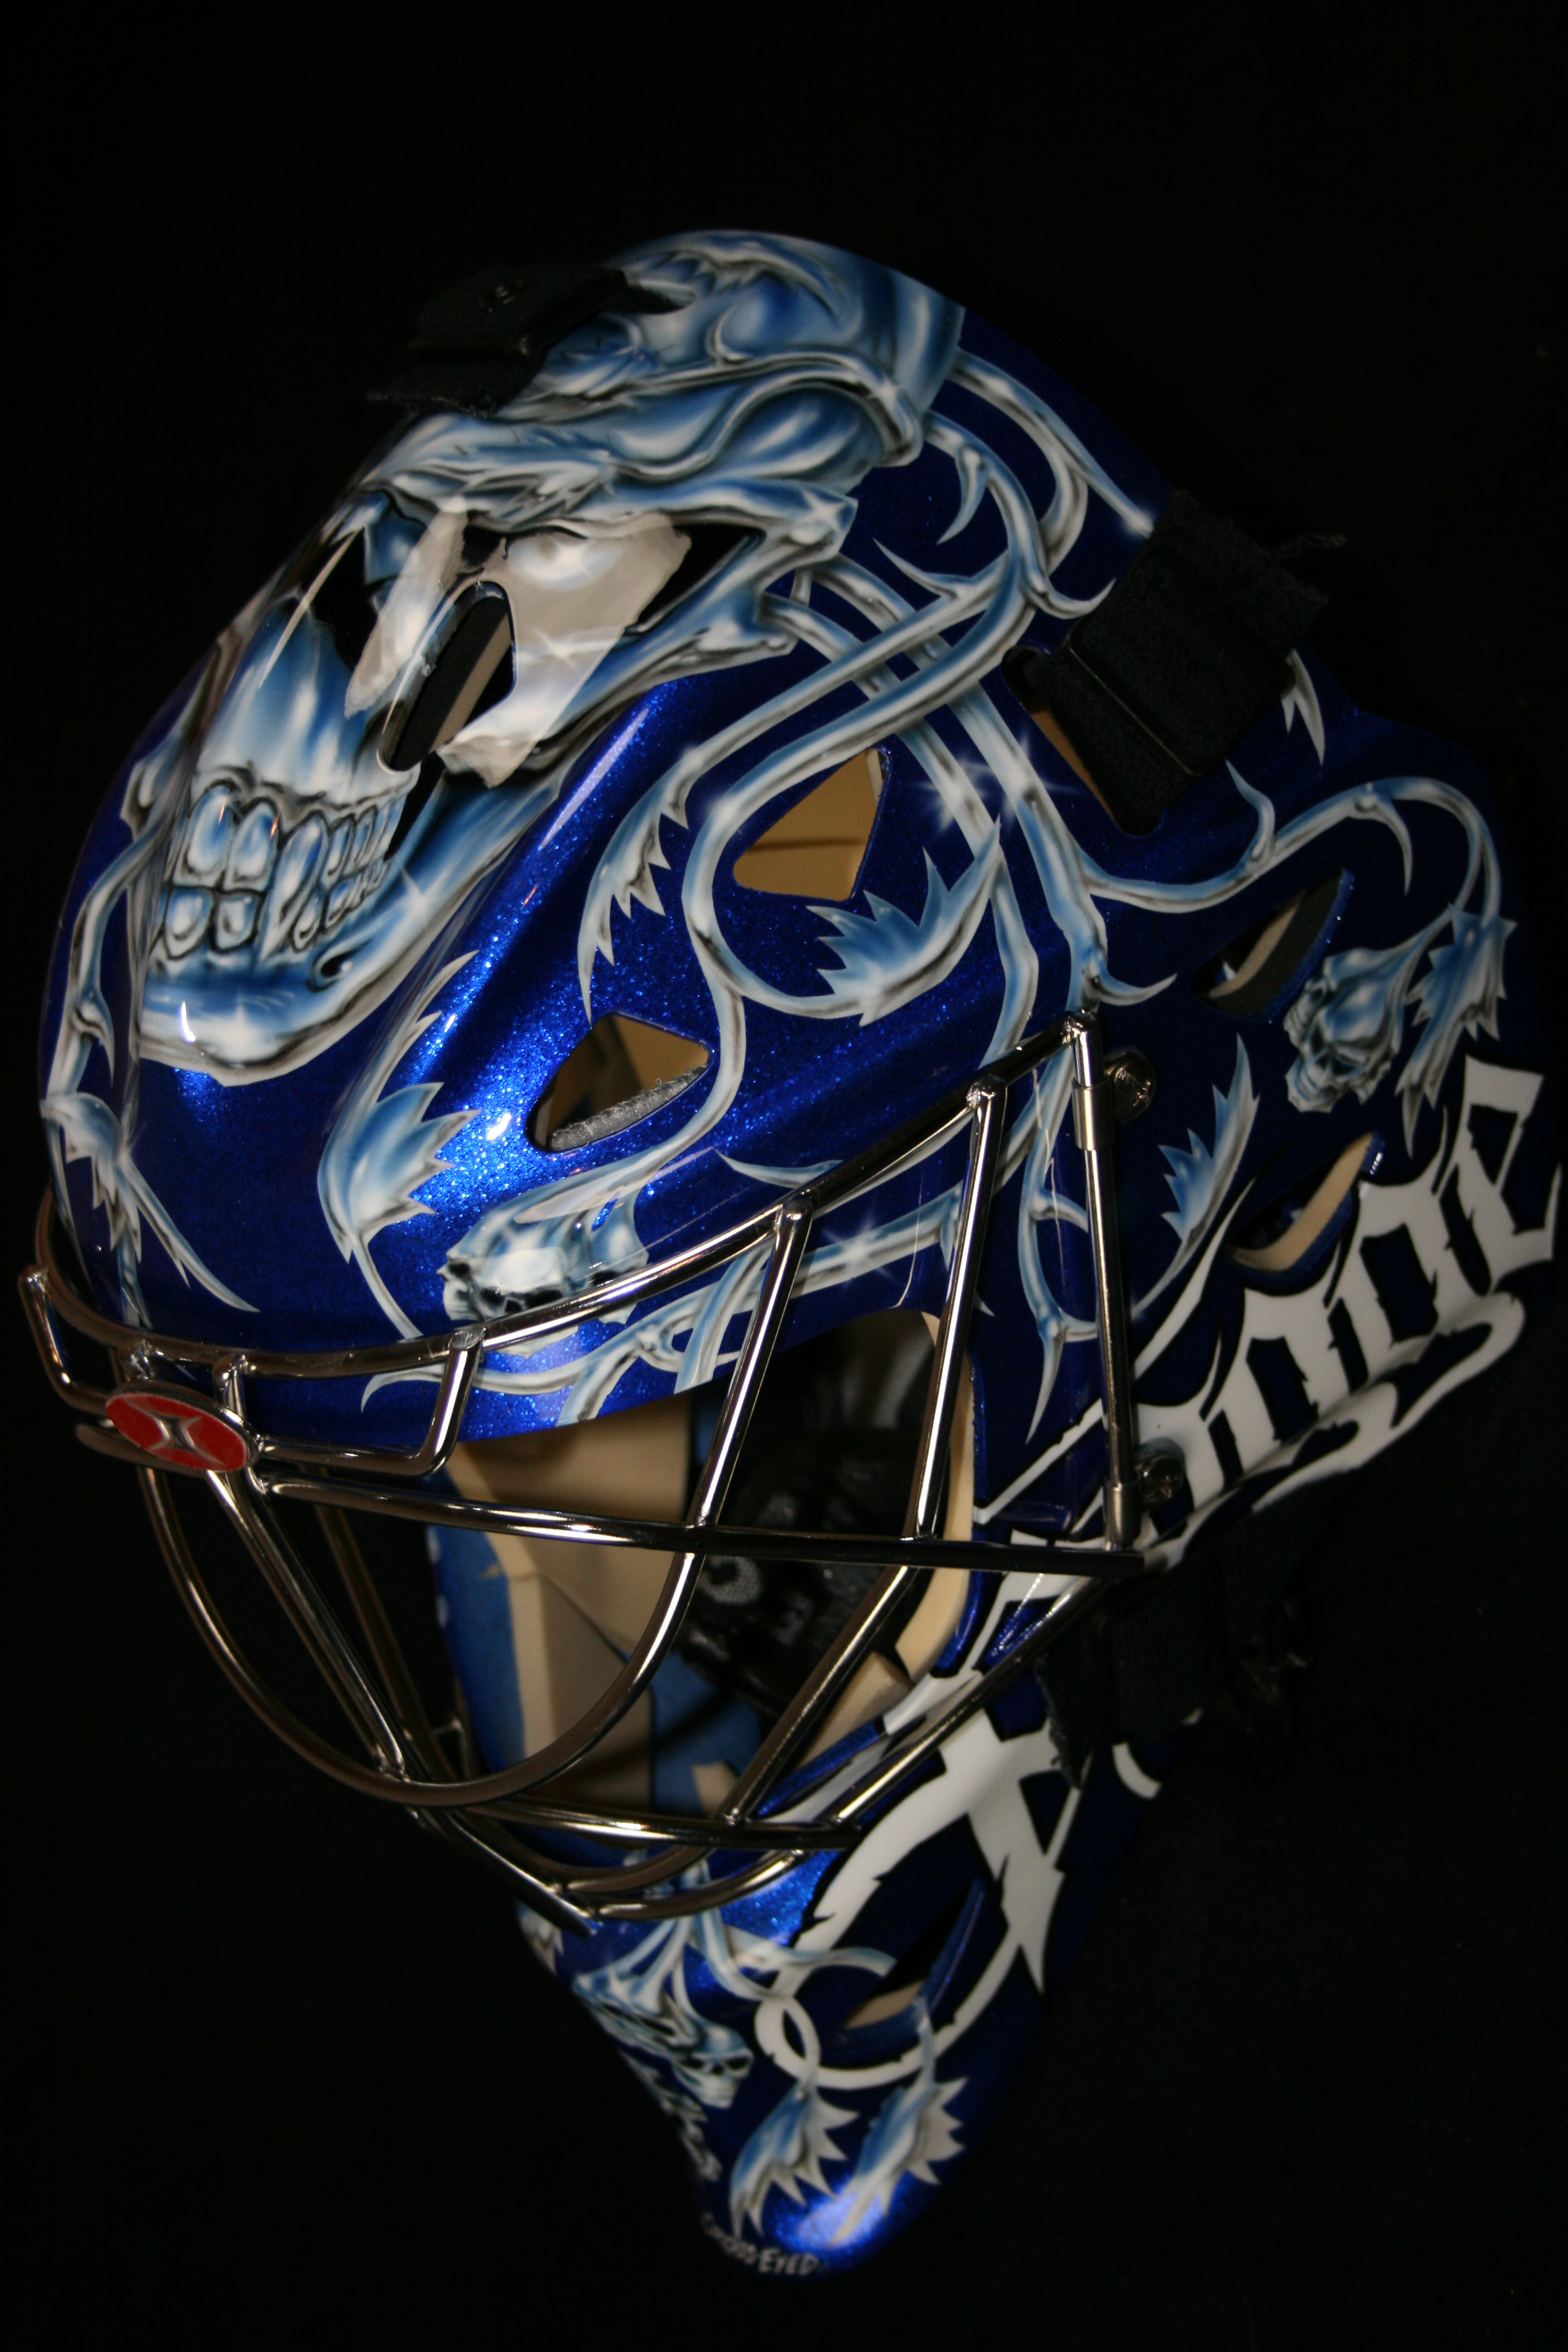 Justin Pogge Toroto Maple Leafs 3